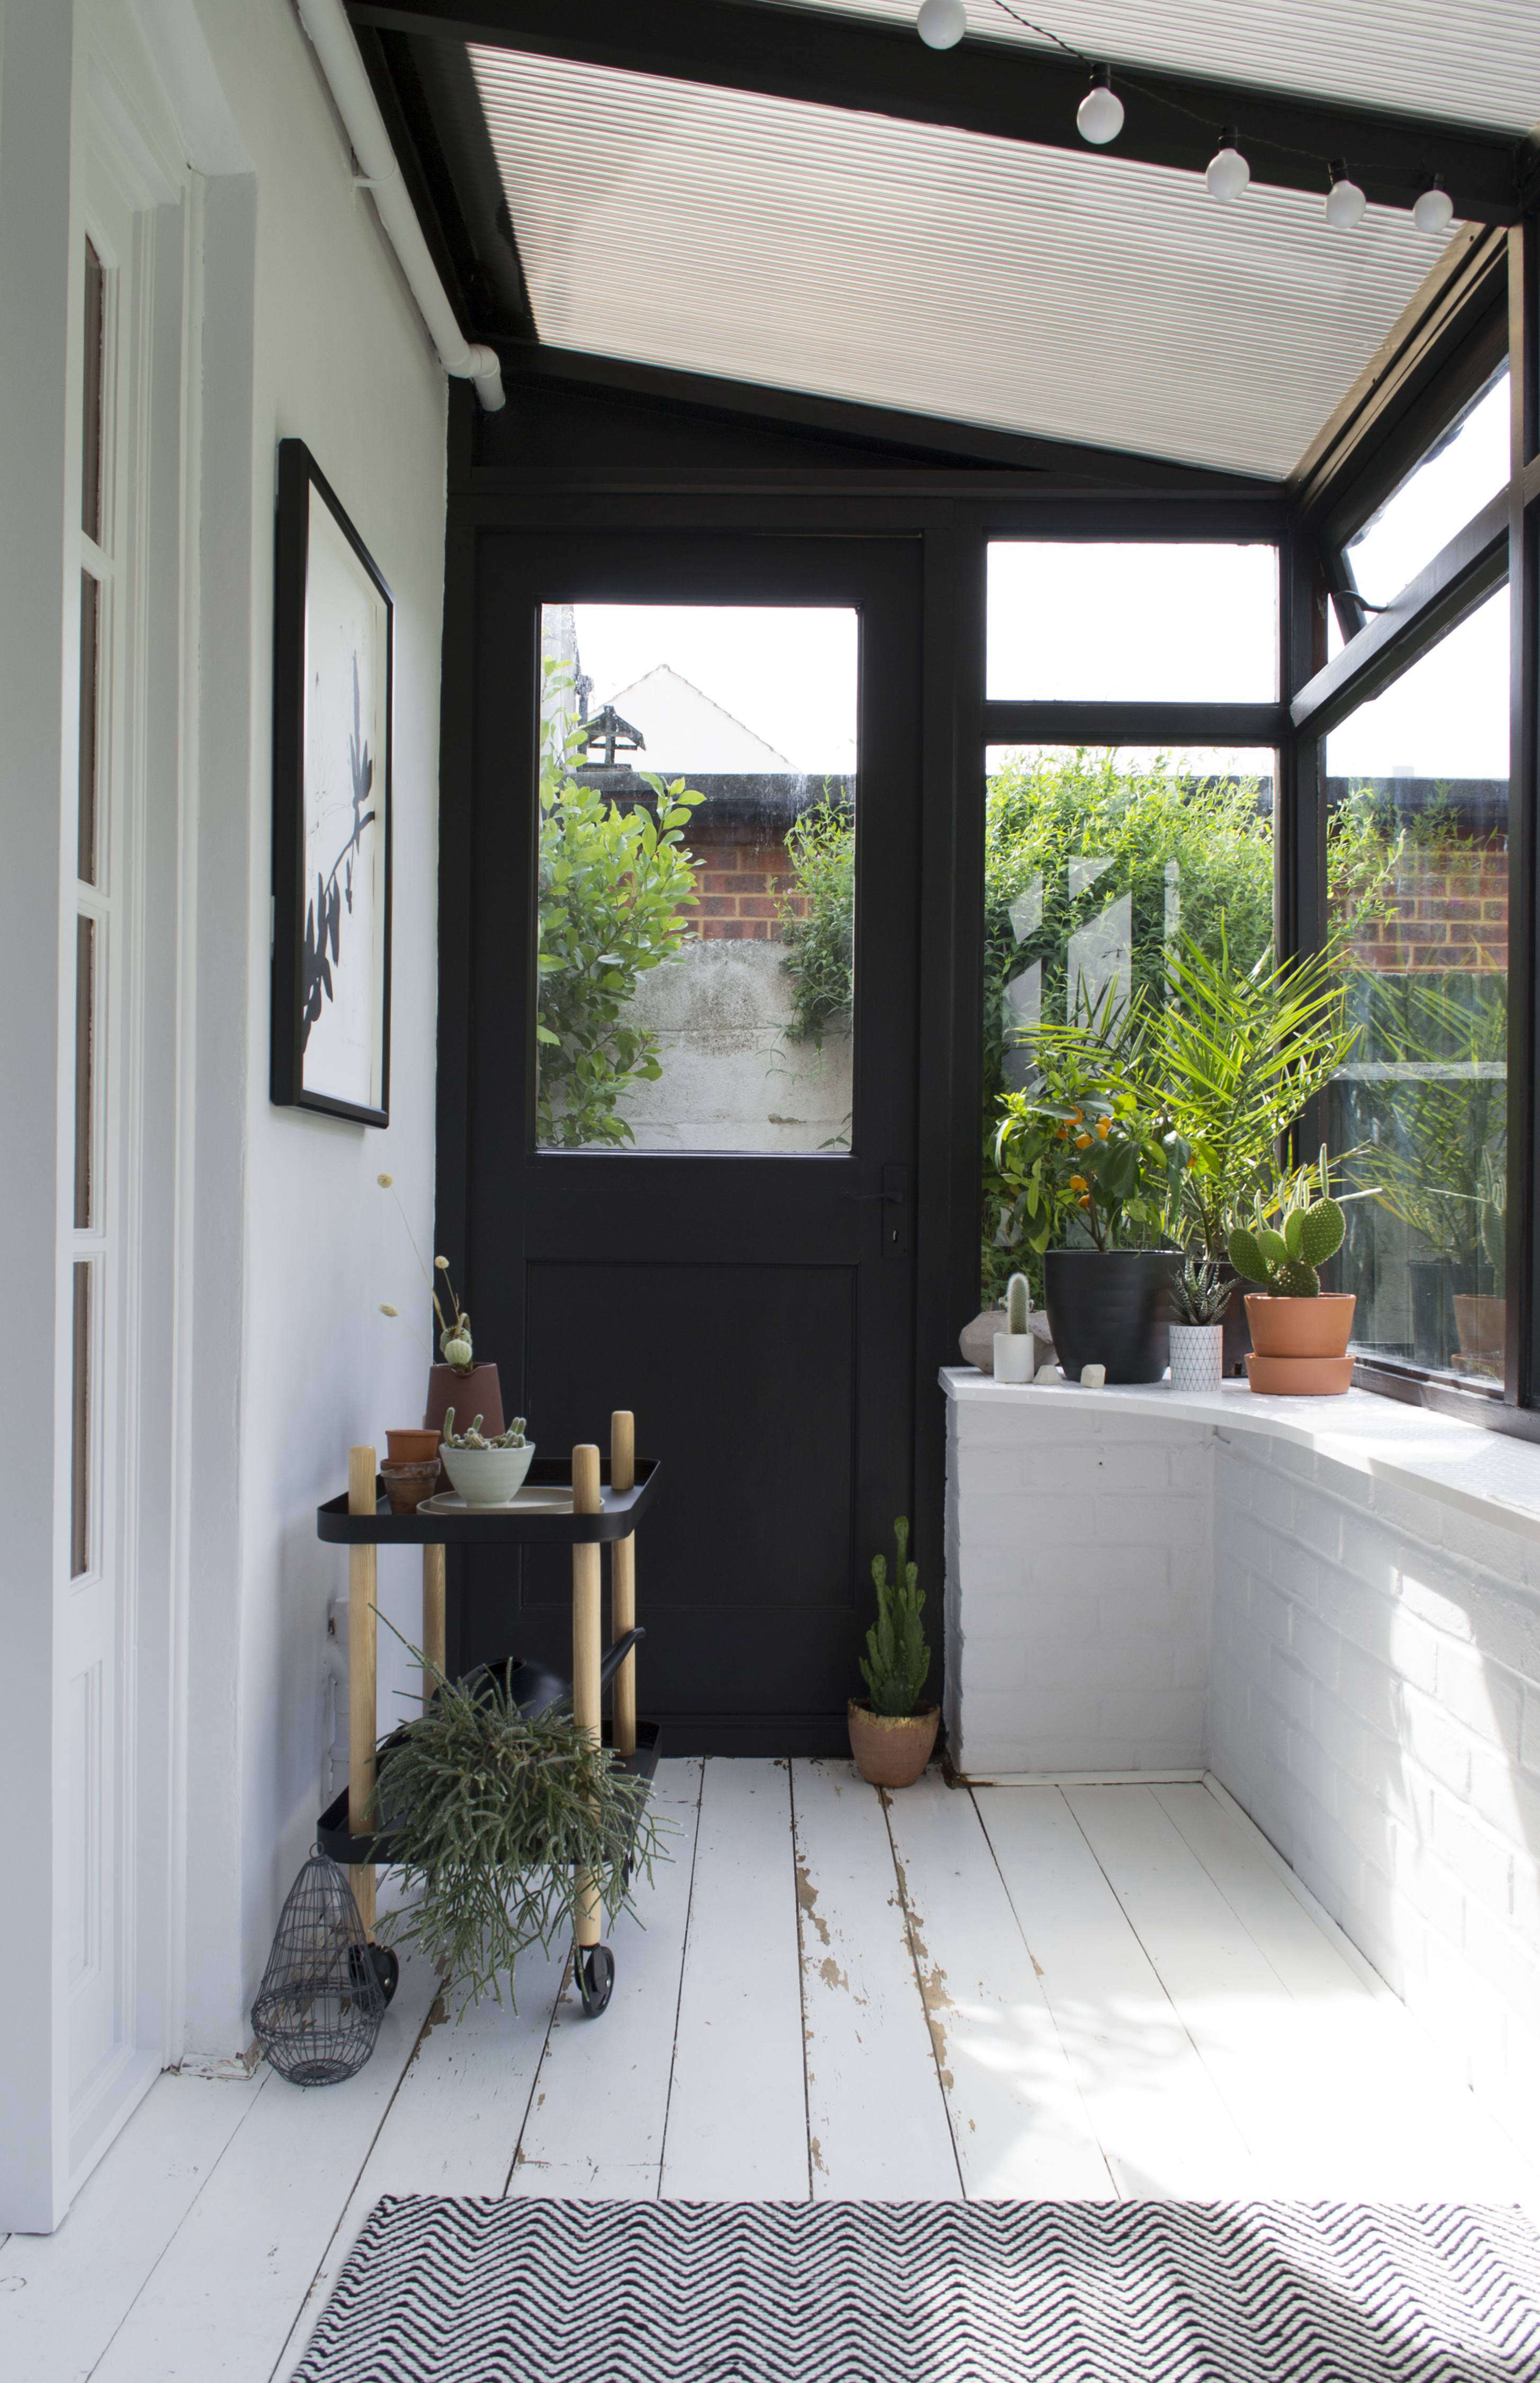 Trending On Gardenista The Windowsill Gardener Remodelista